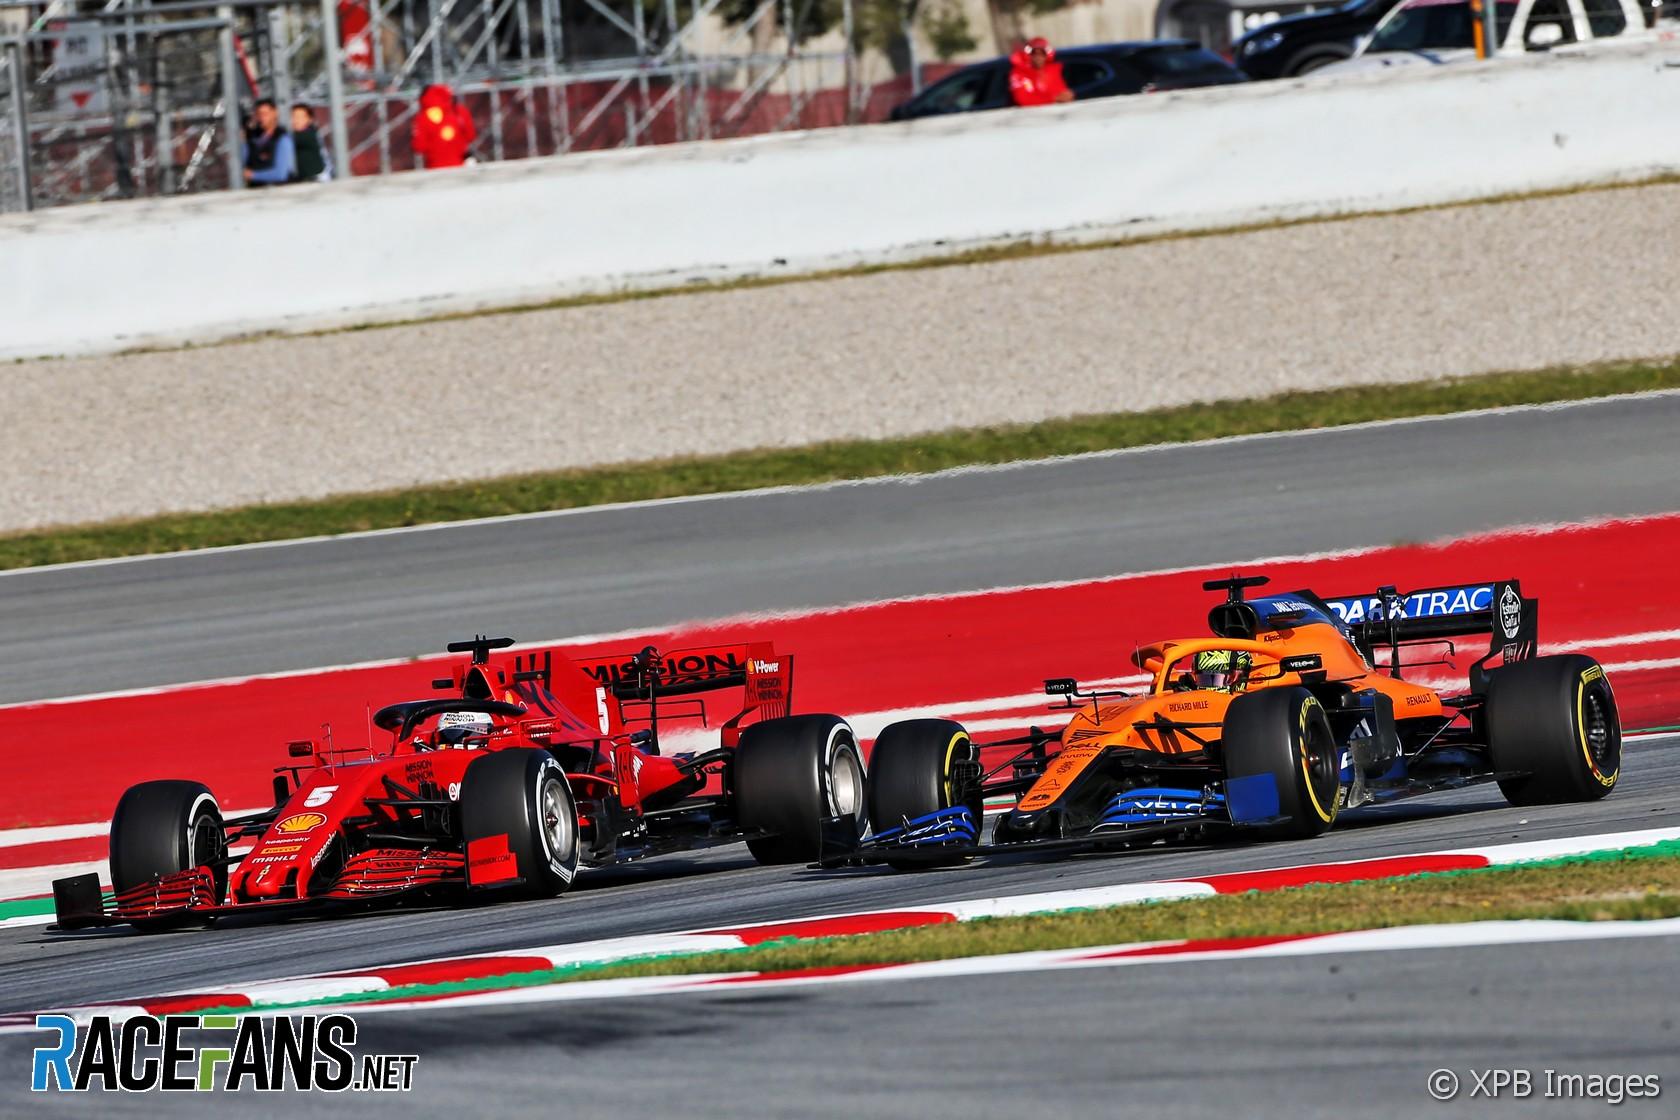 Lando Norris, Sebastian Vettel, Circuit de Catalunya, 2020